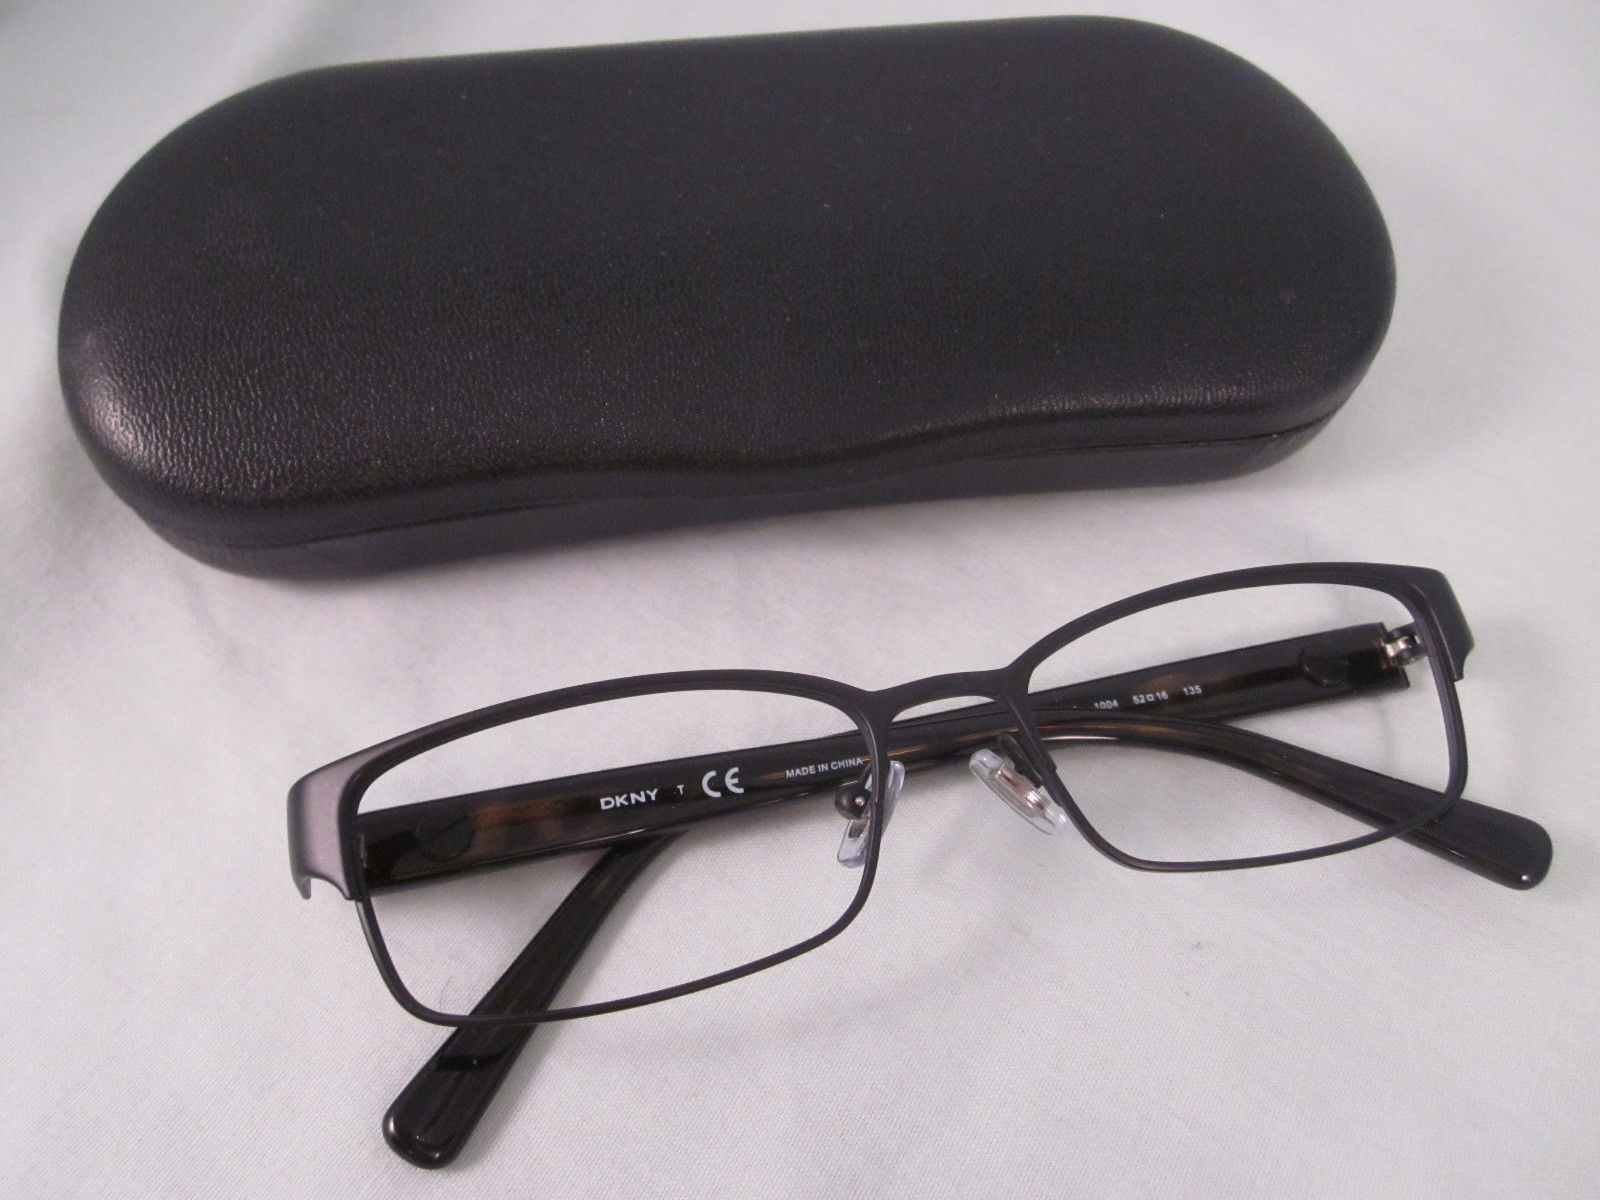 DKNY Eyeglasses: 11 listings